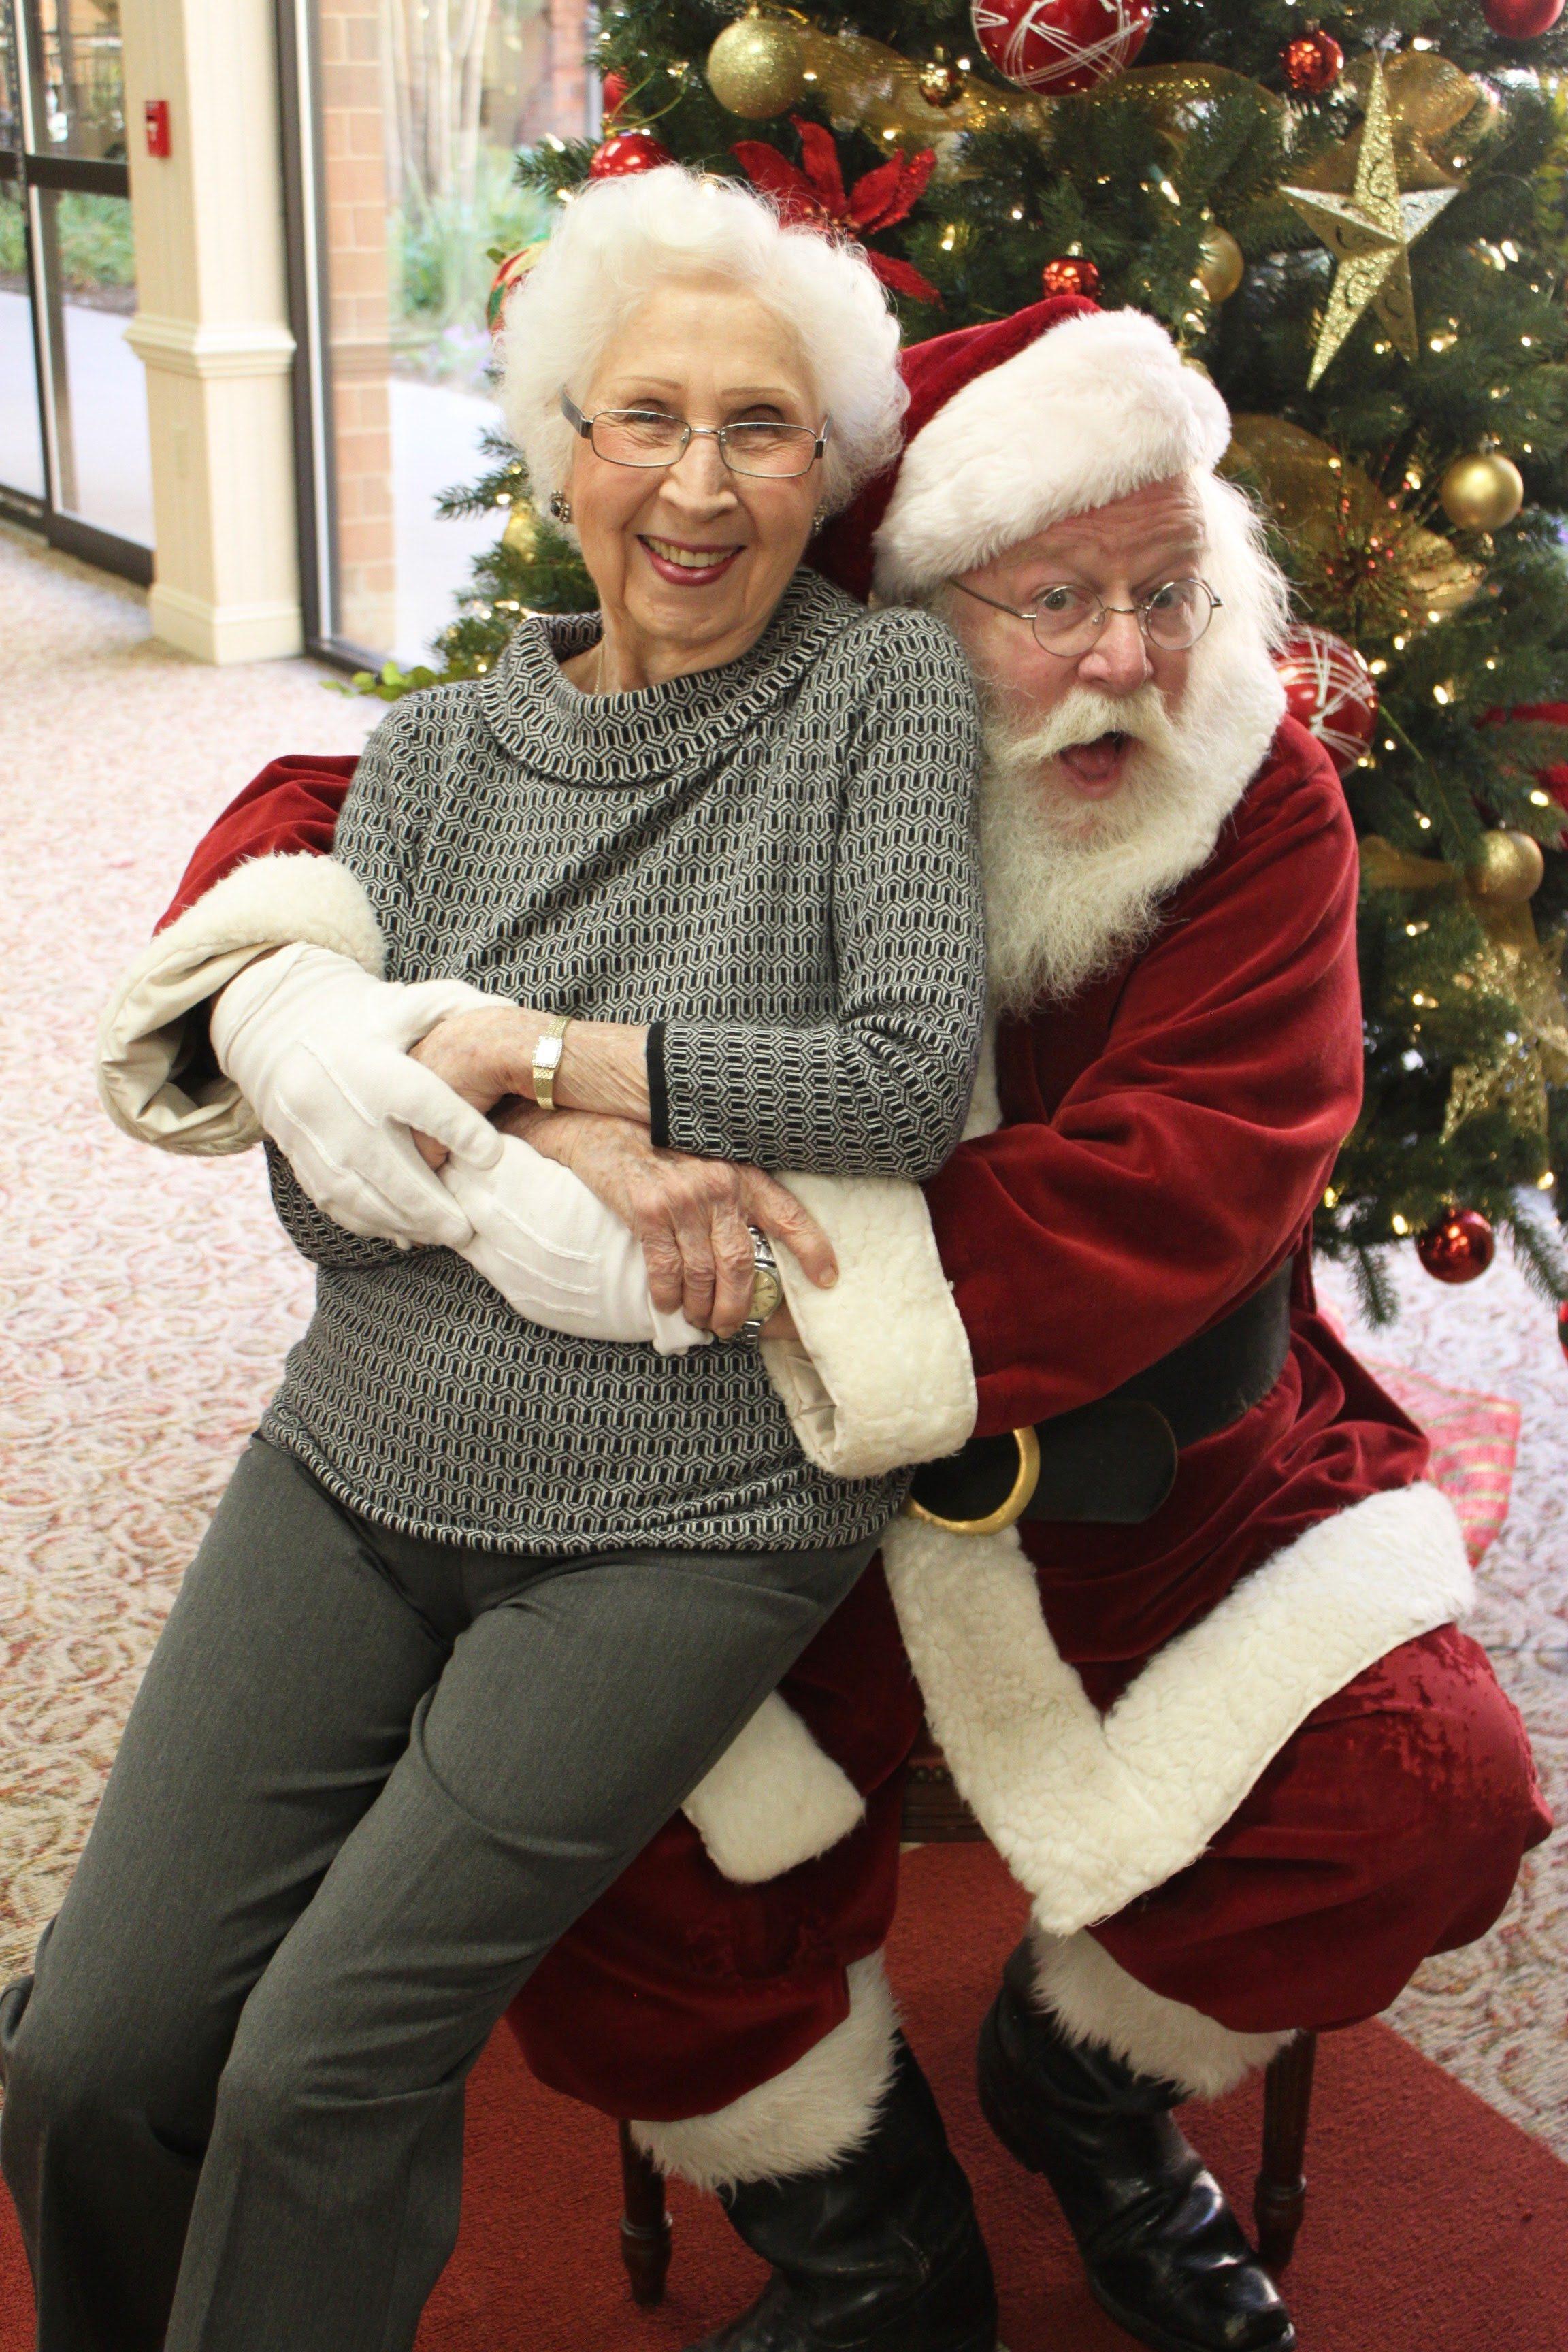 Lady on Santa's lap